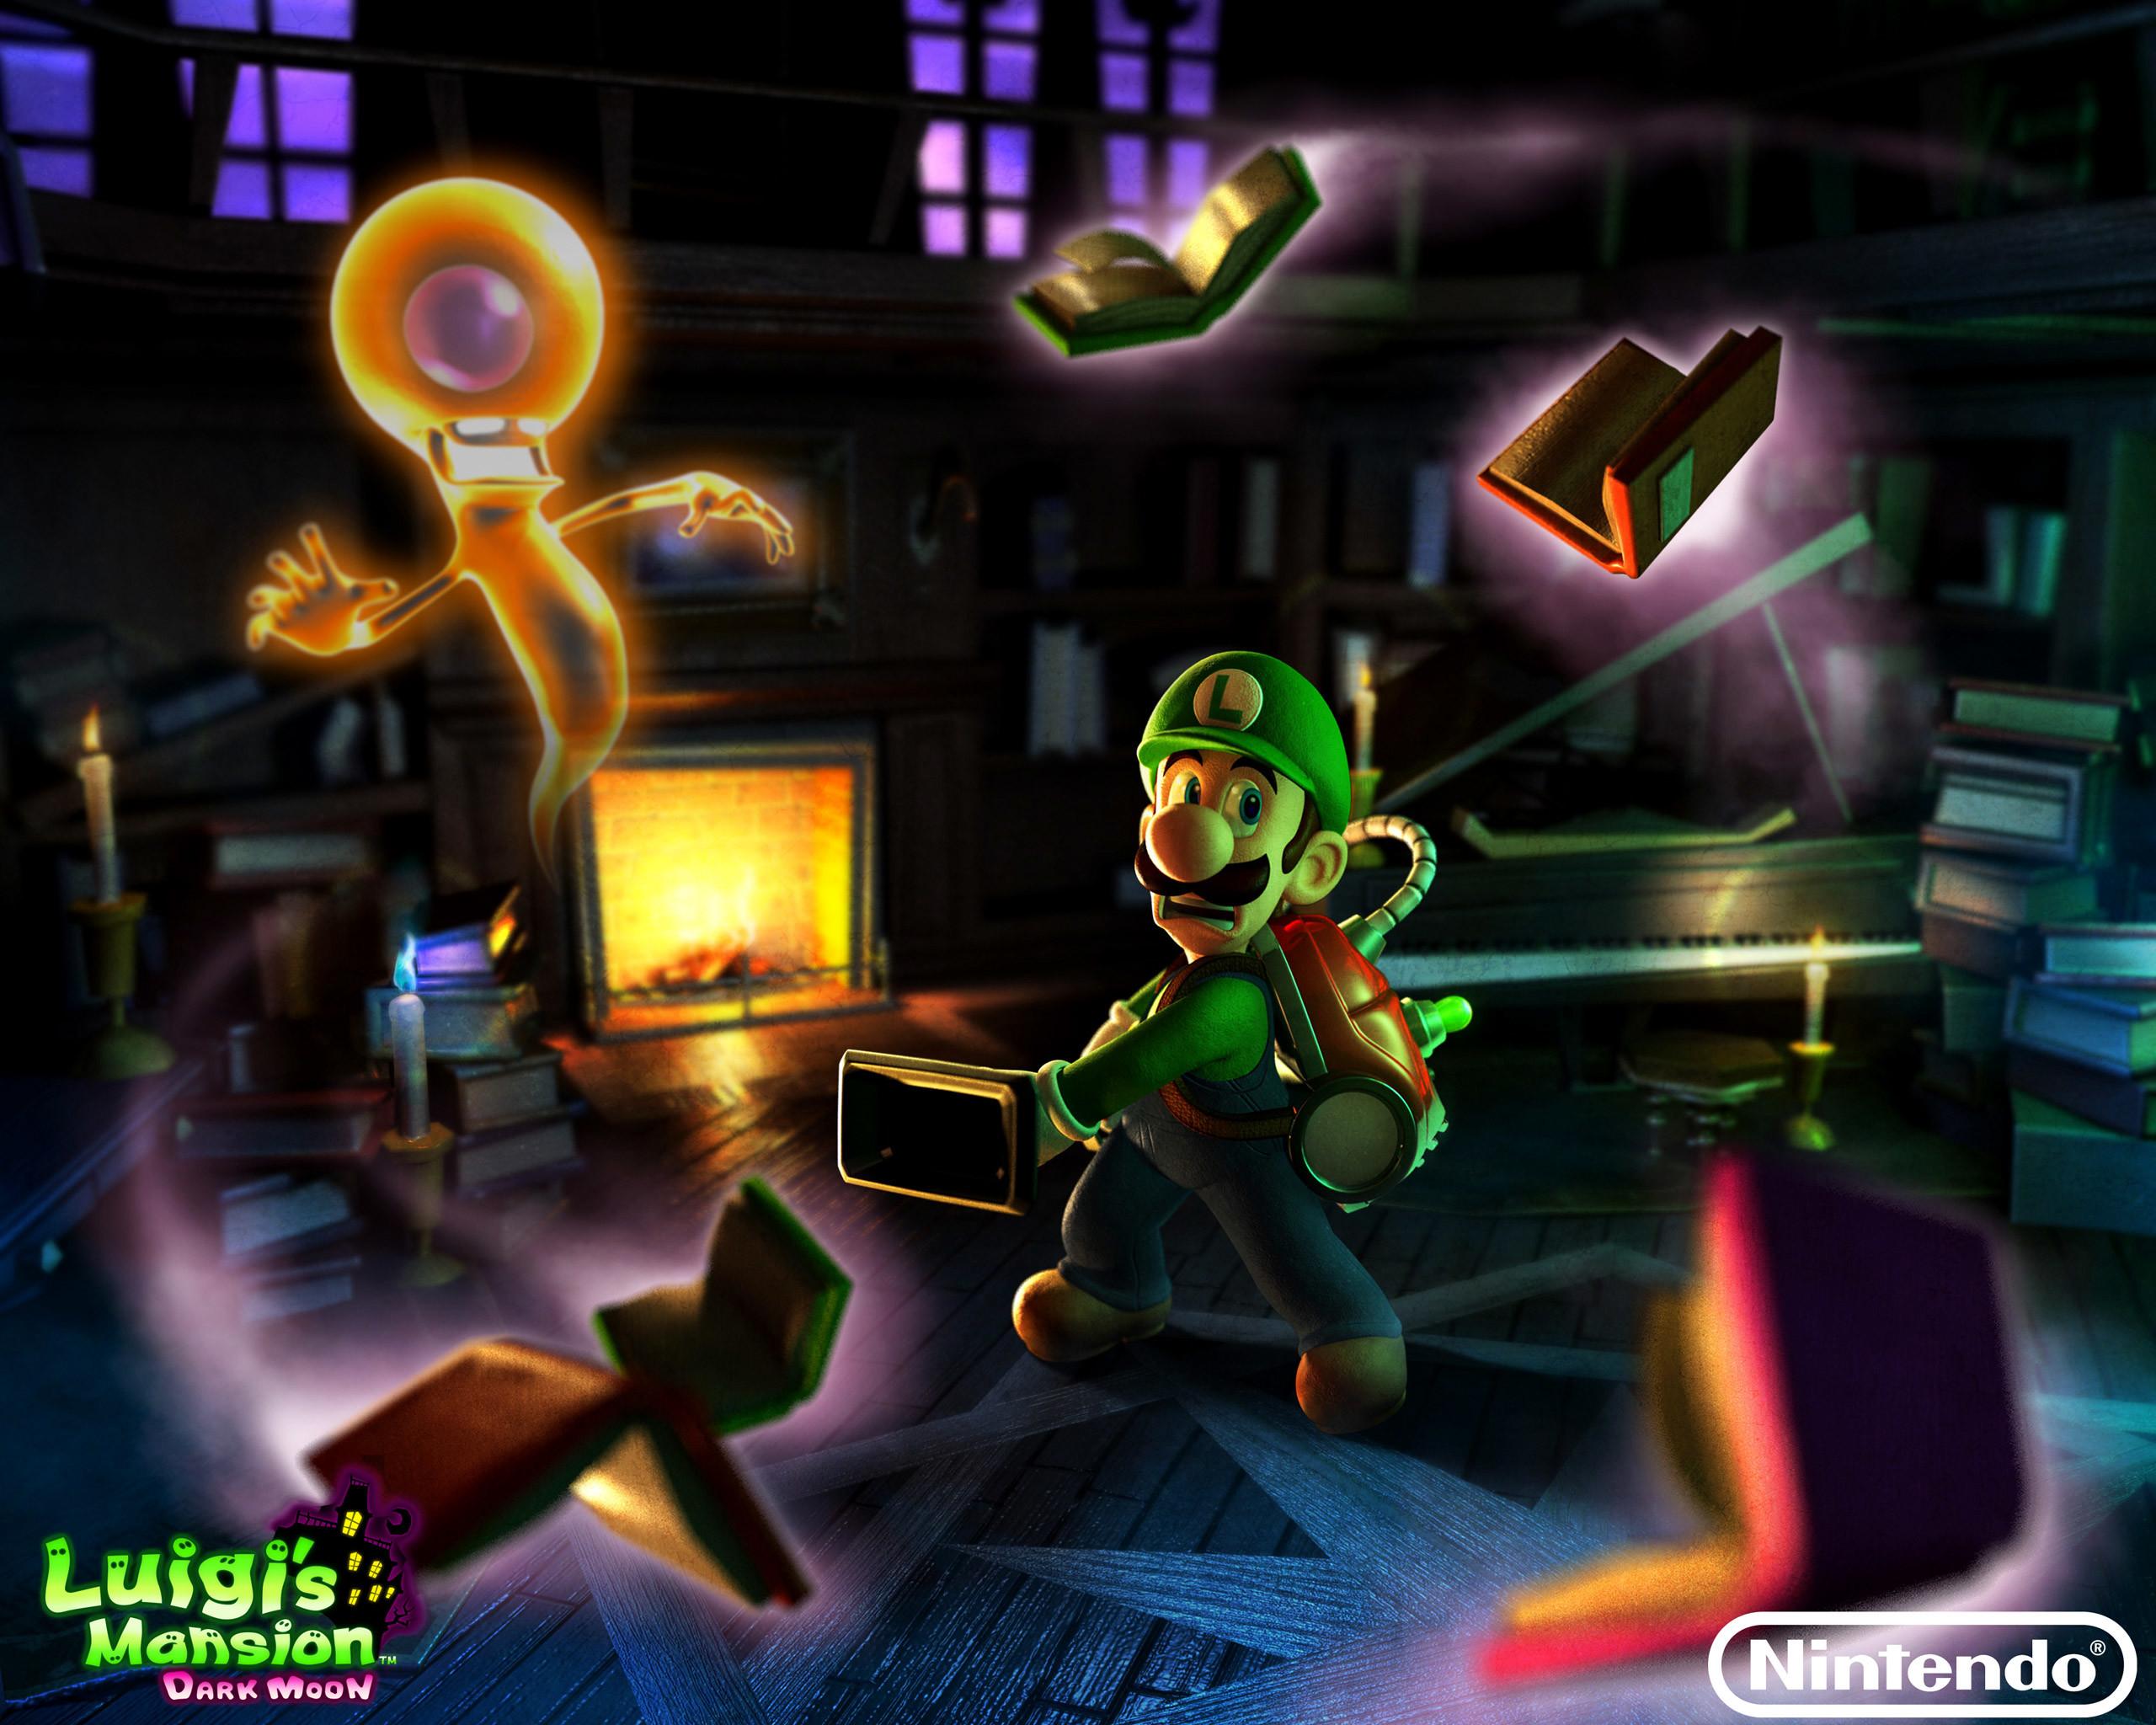 Luigis Mansion Dark Moon Wallpaper 57 Images